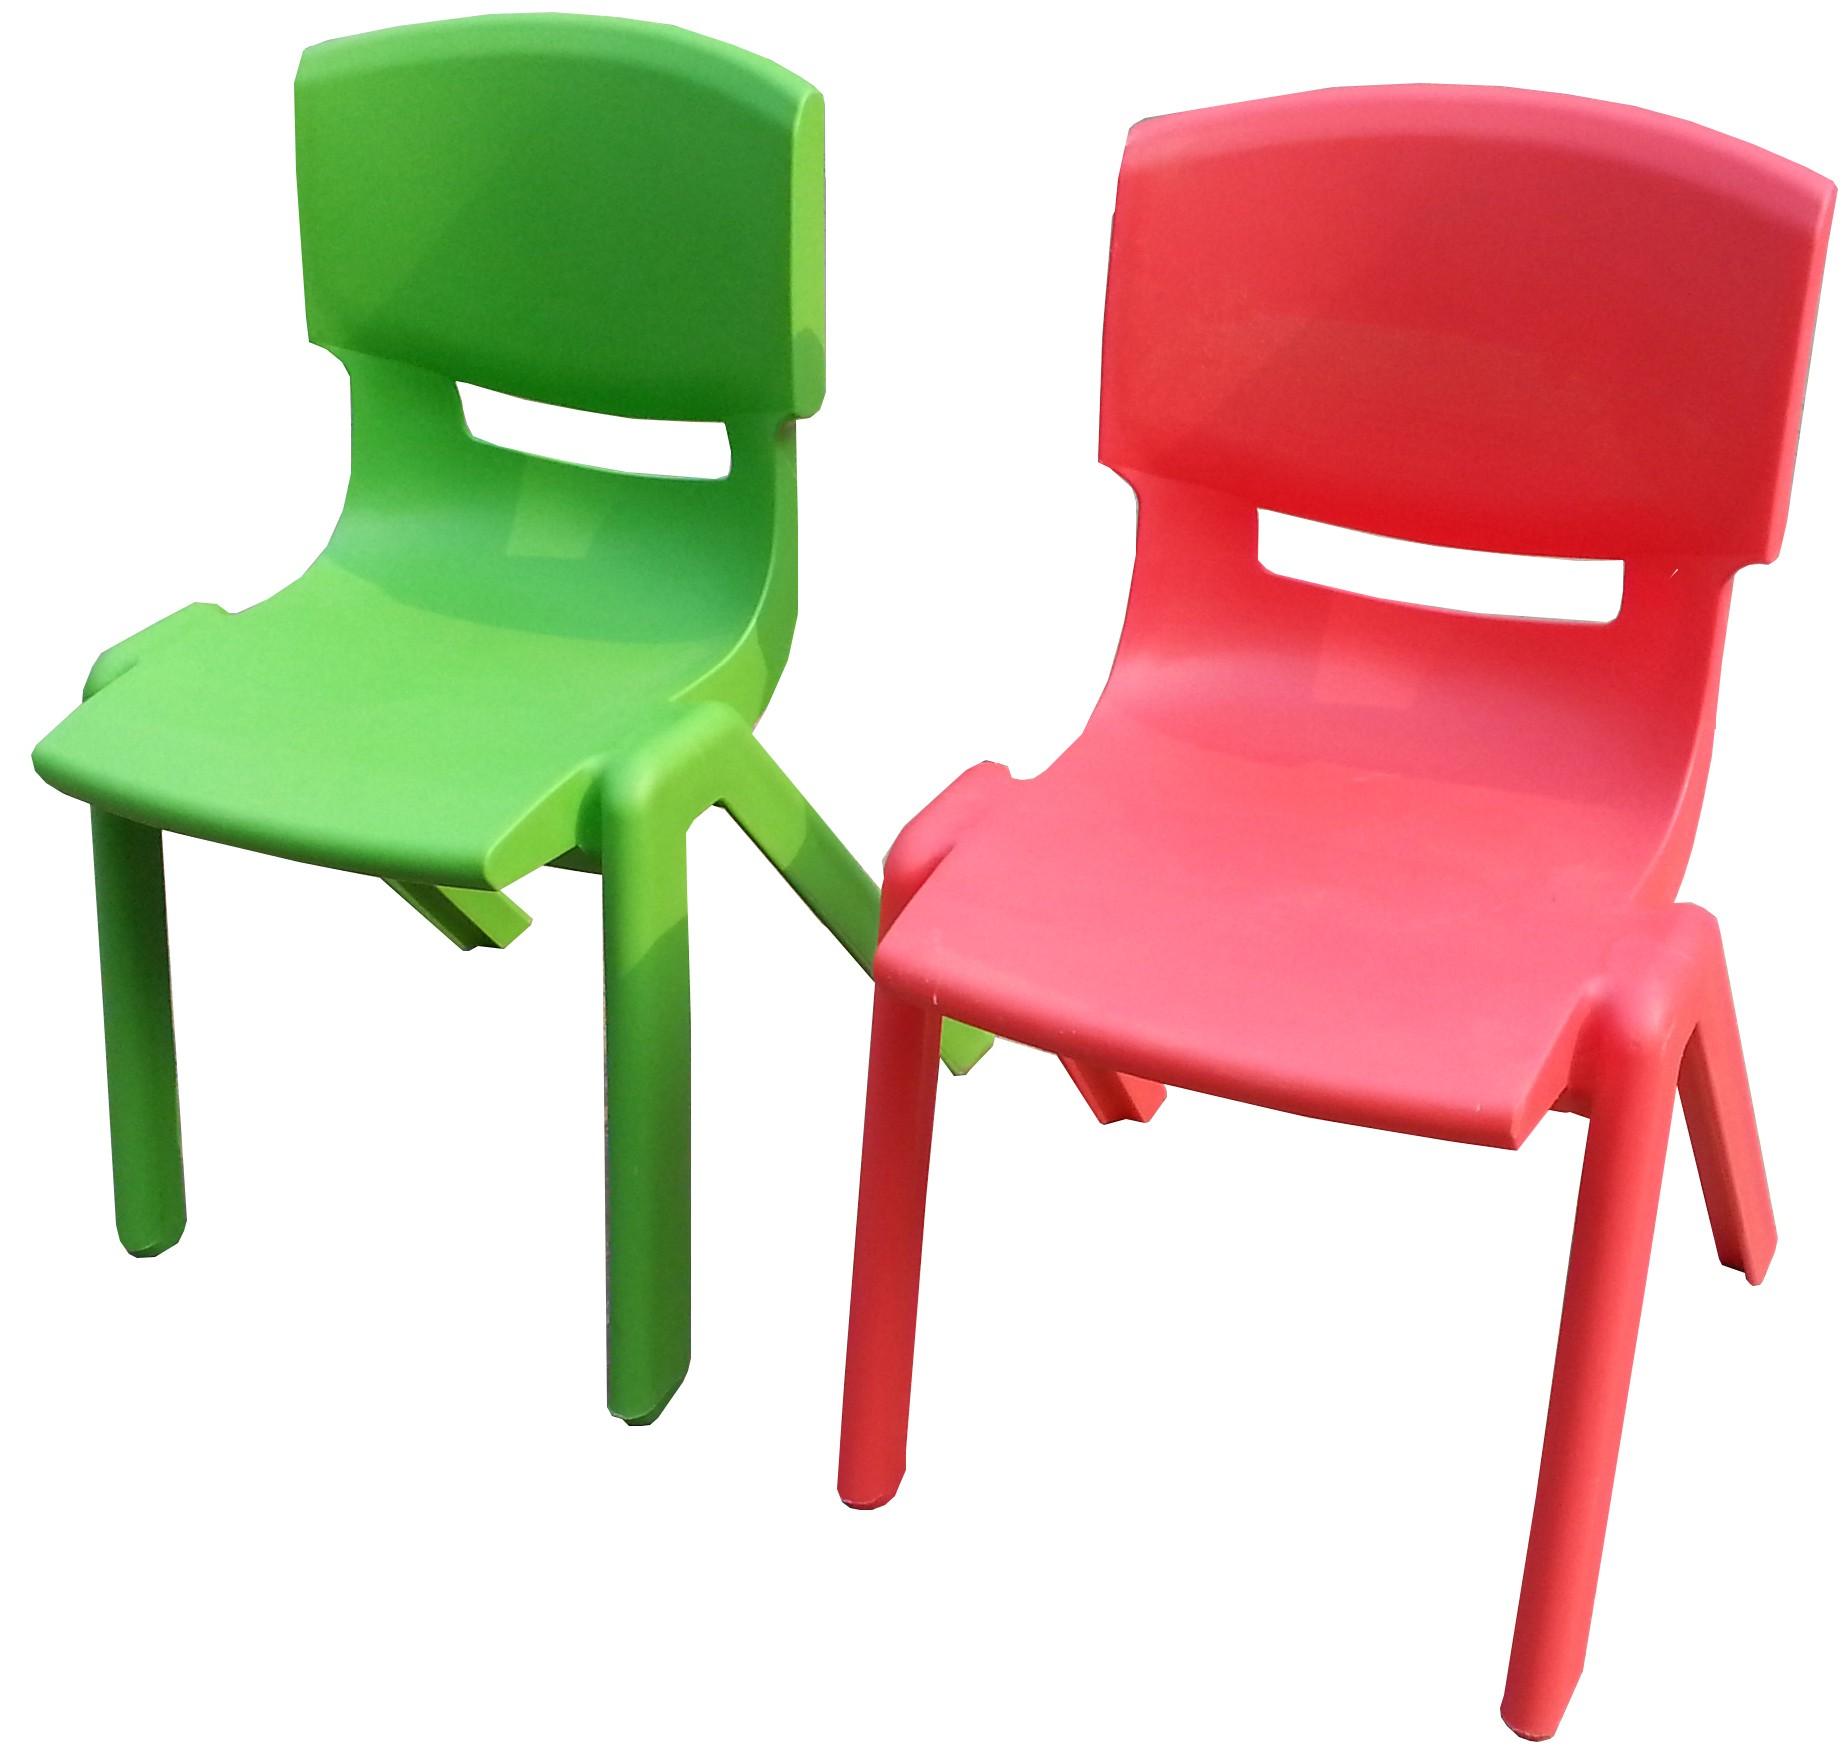 Ghế nhựa đúc cao 35